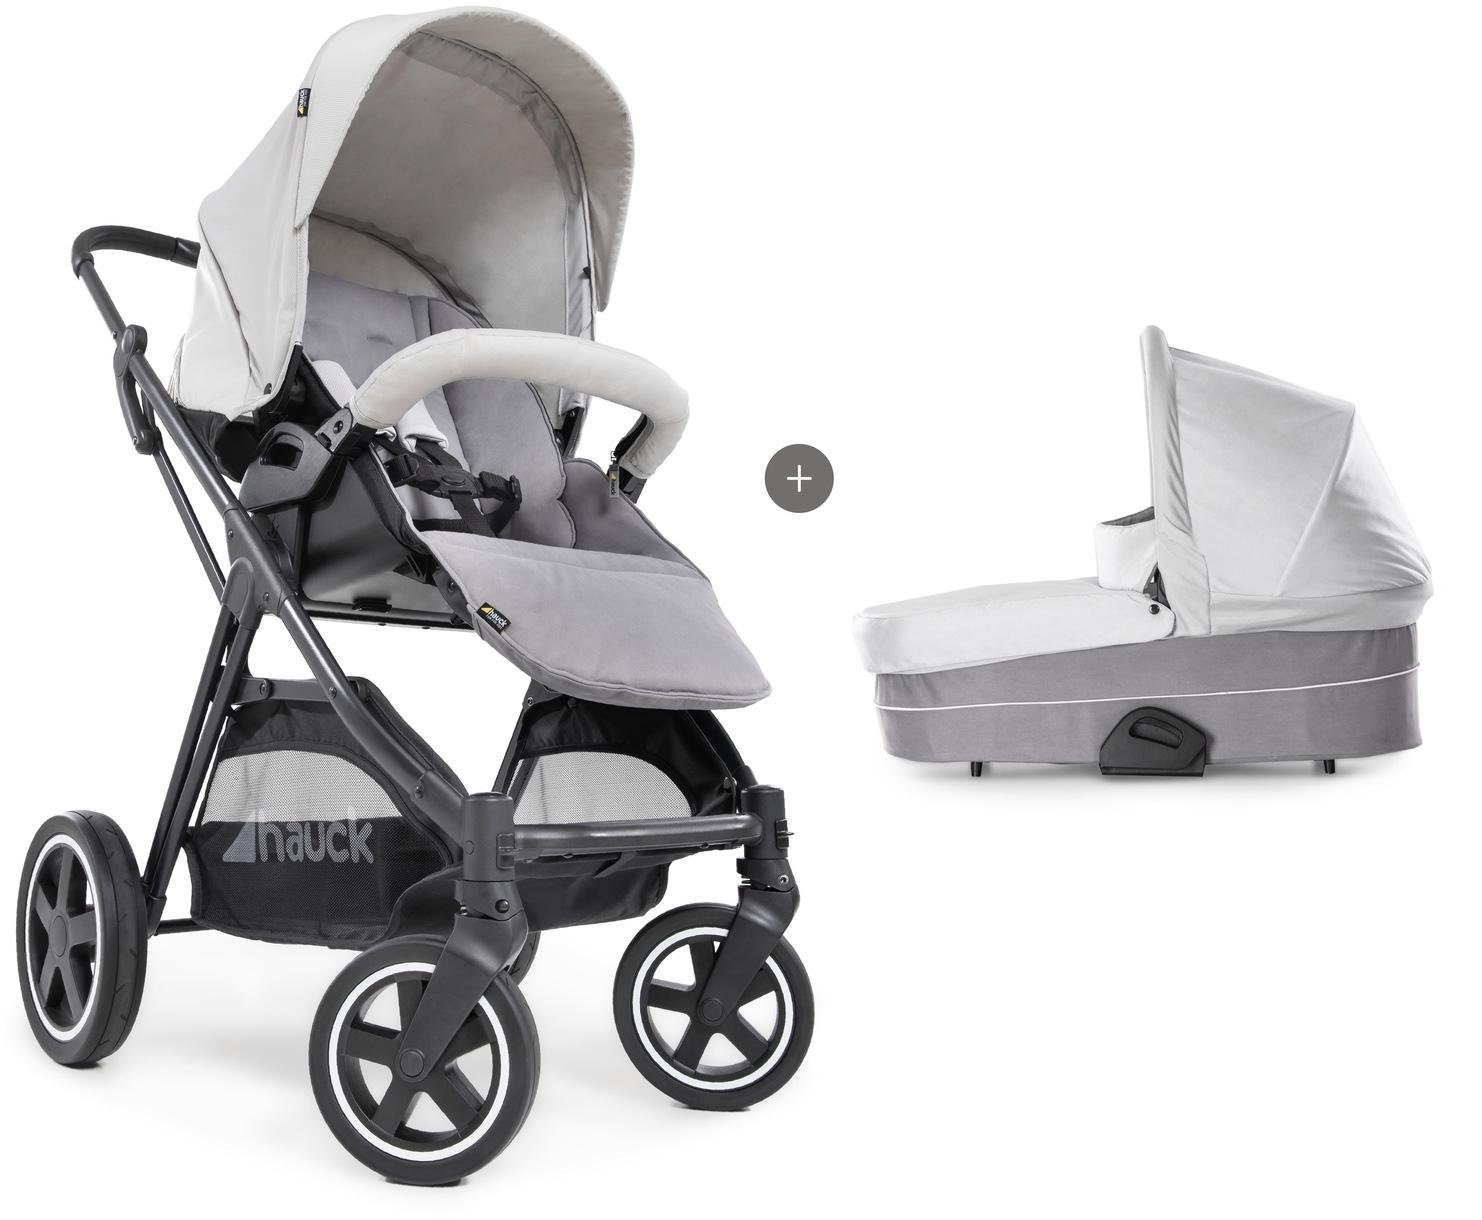 "Hauck Kombi-Kinderwagen ""iPro Mars Duoset Lunar/Stone"" Kindermode/Ausstattung/Kinderwagen & Buggies/Kinderwagen/Kombikinderwagen"